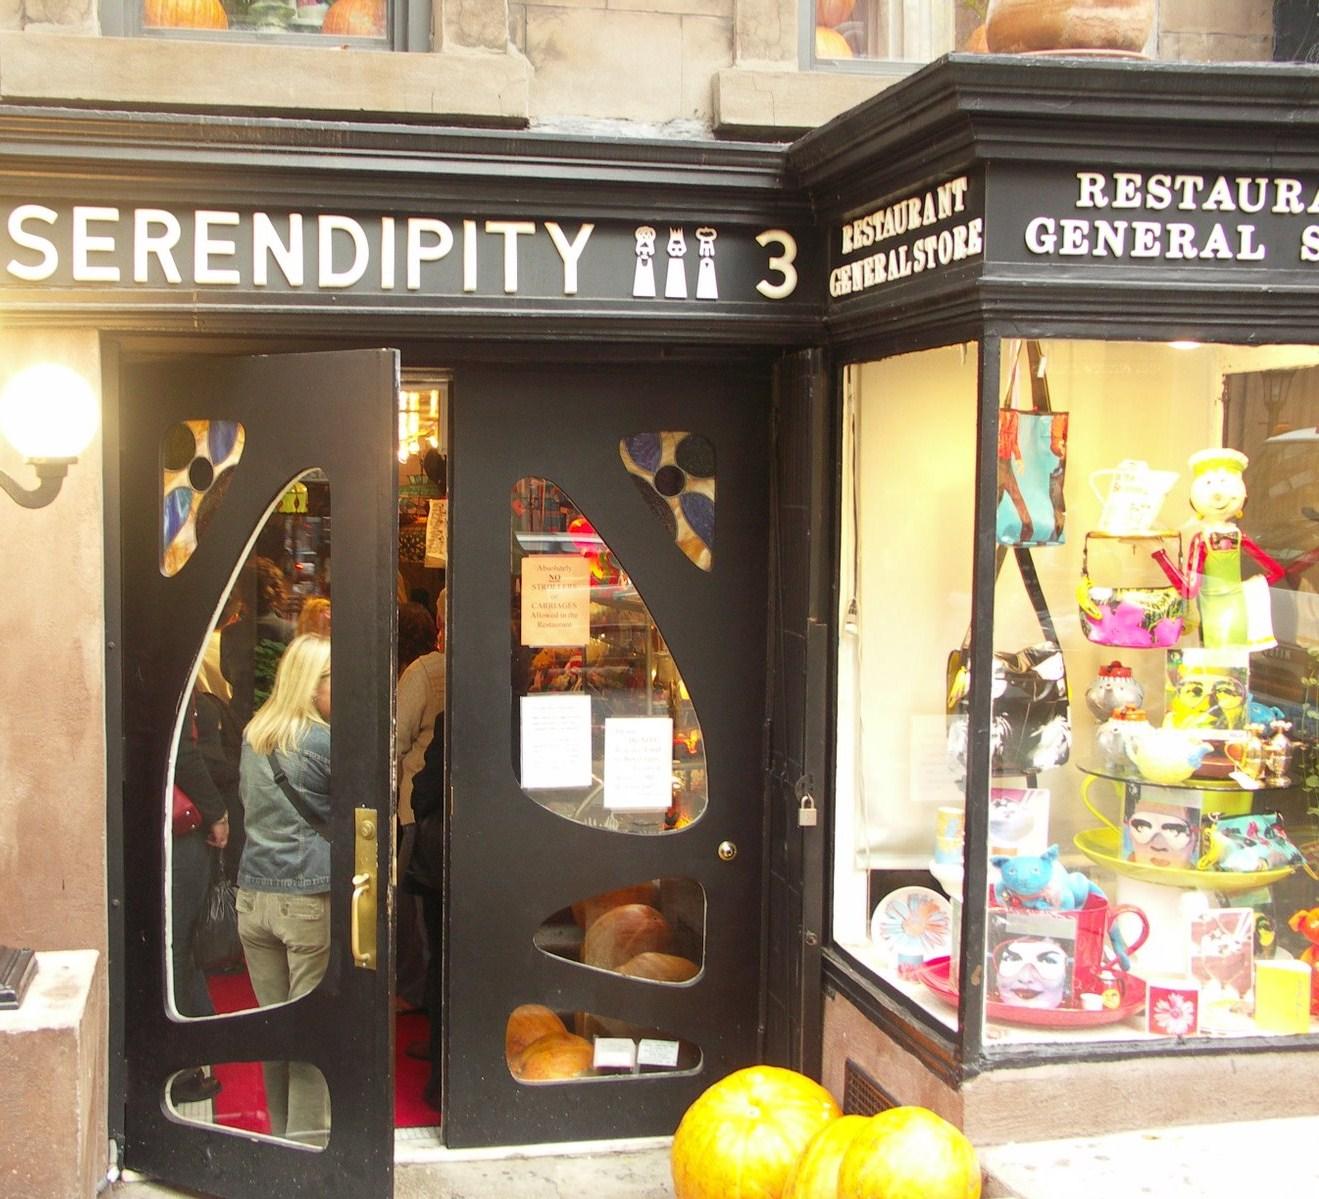 Serendipity+Restaurant+NYC+2-12-09 (image)